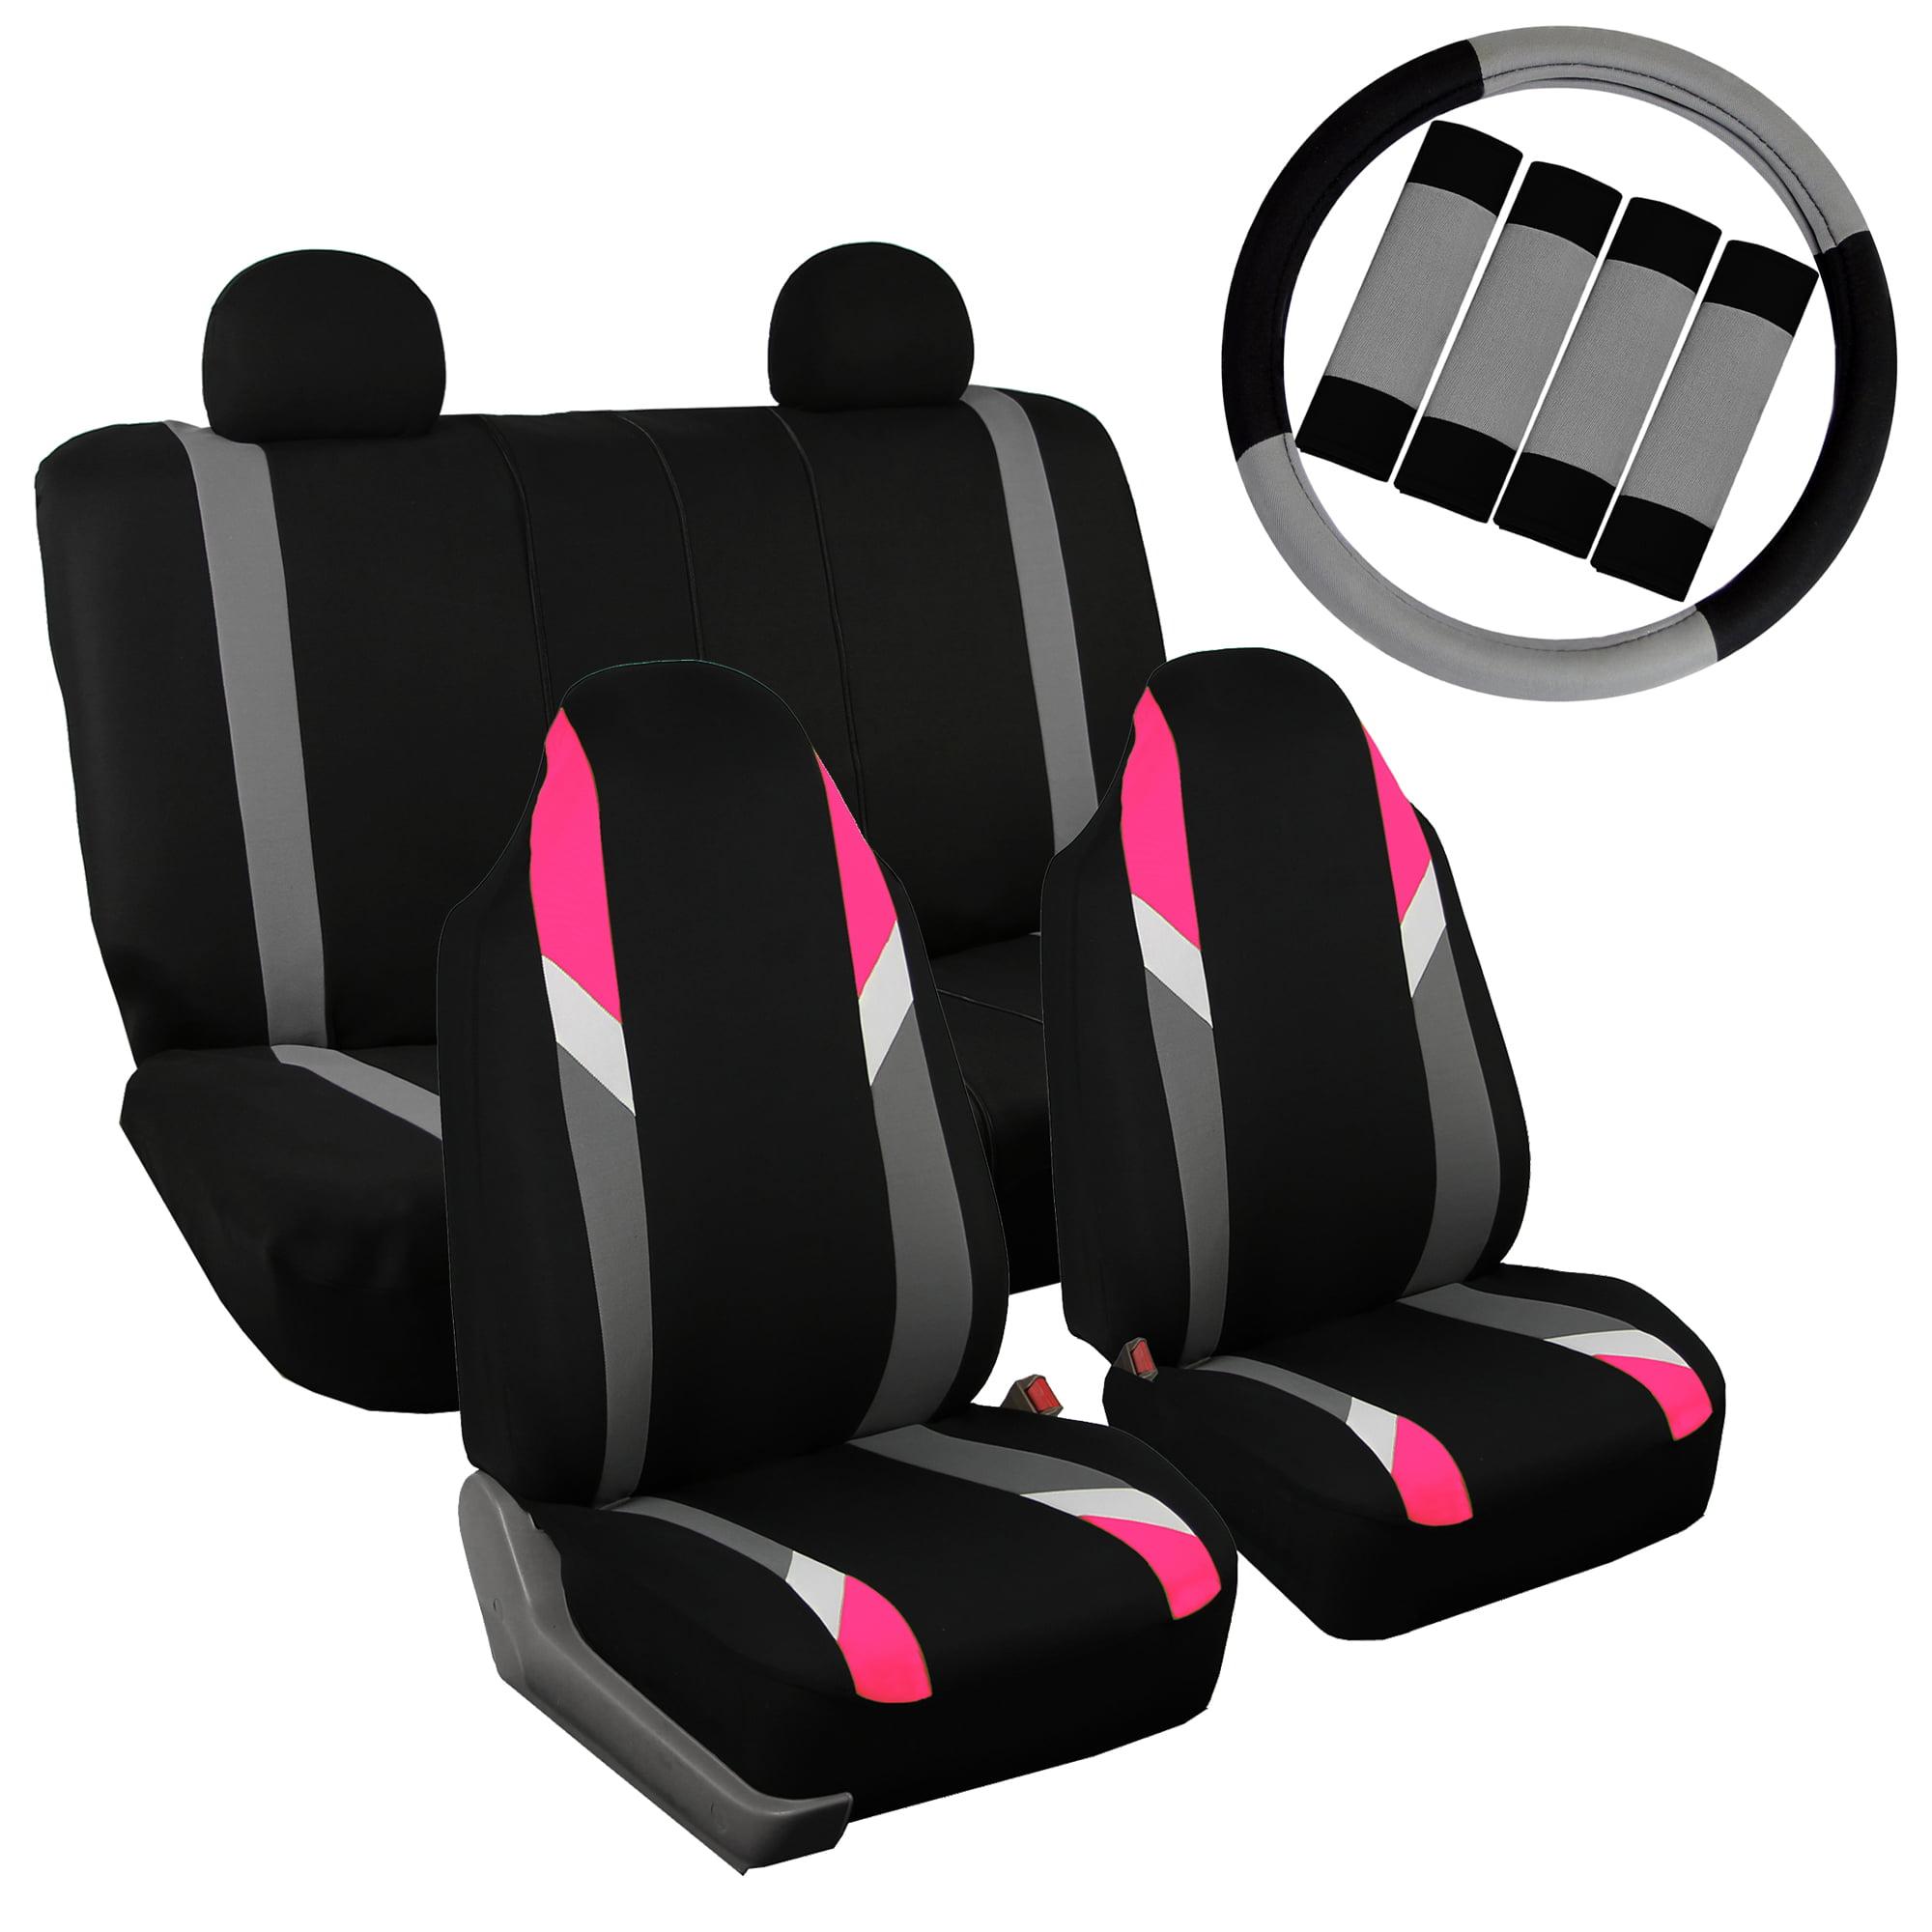 FH Group Car Seat Covers Supreme Modernistic for Sedan, SUV, Van, Full Set w/ Steering Cover & Belt Pads, Pink Black